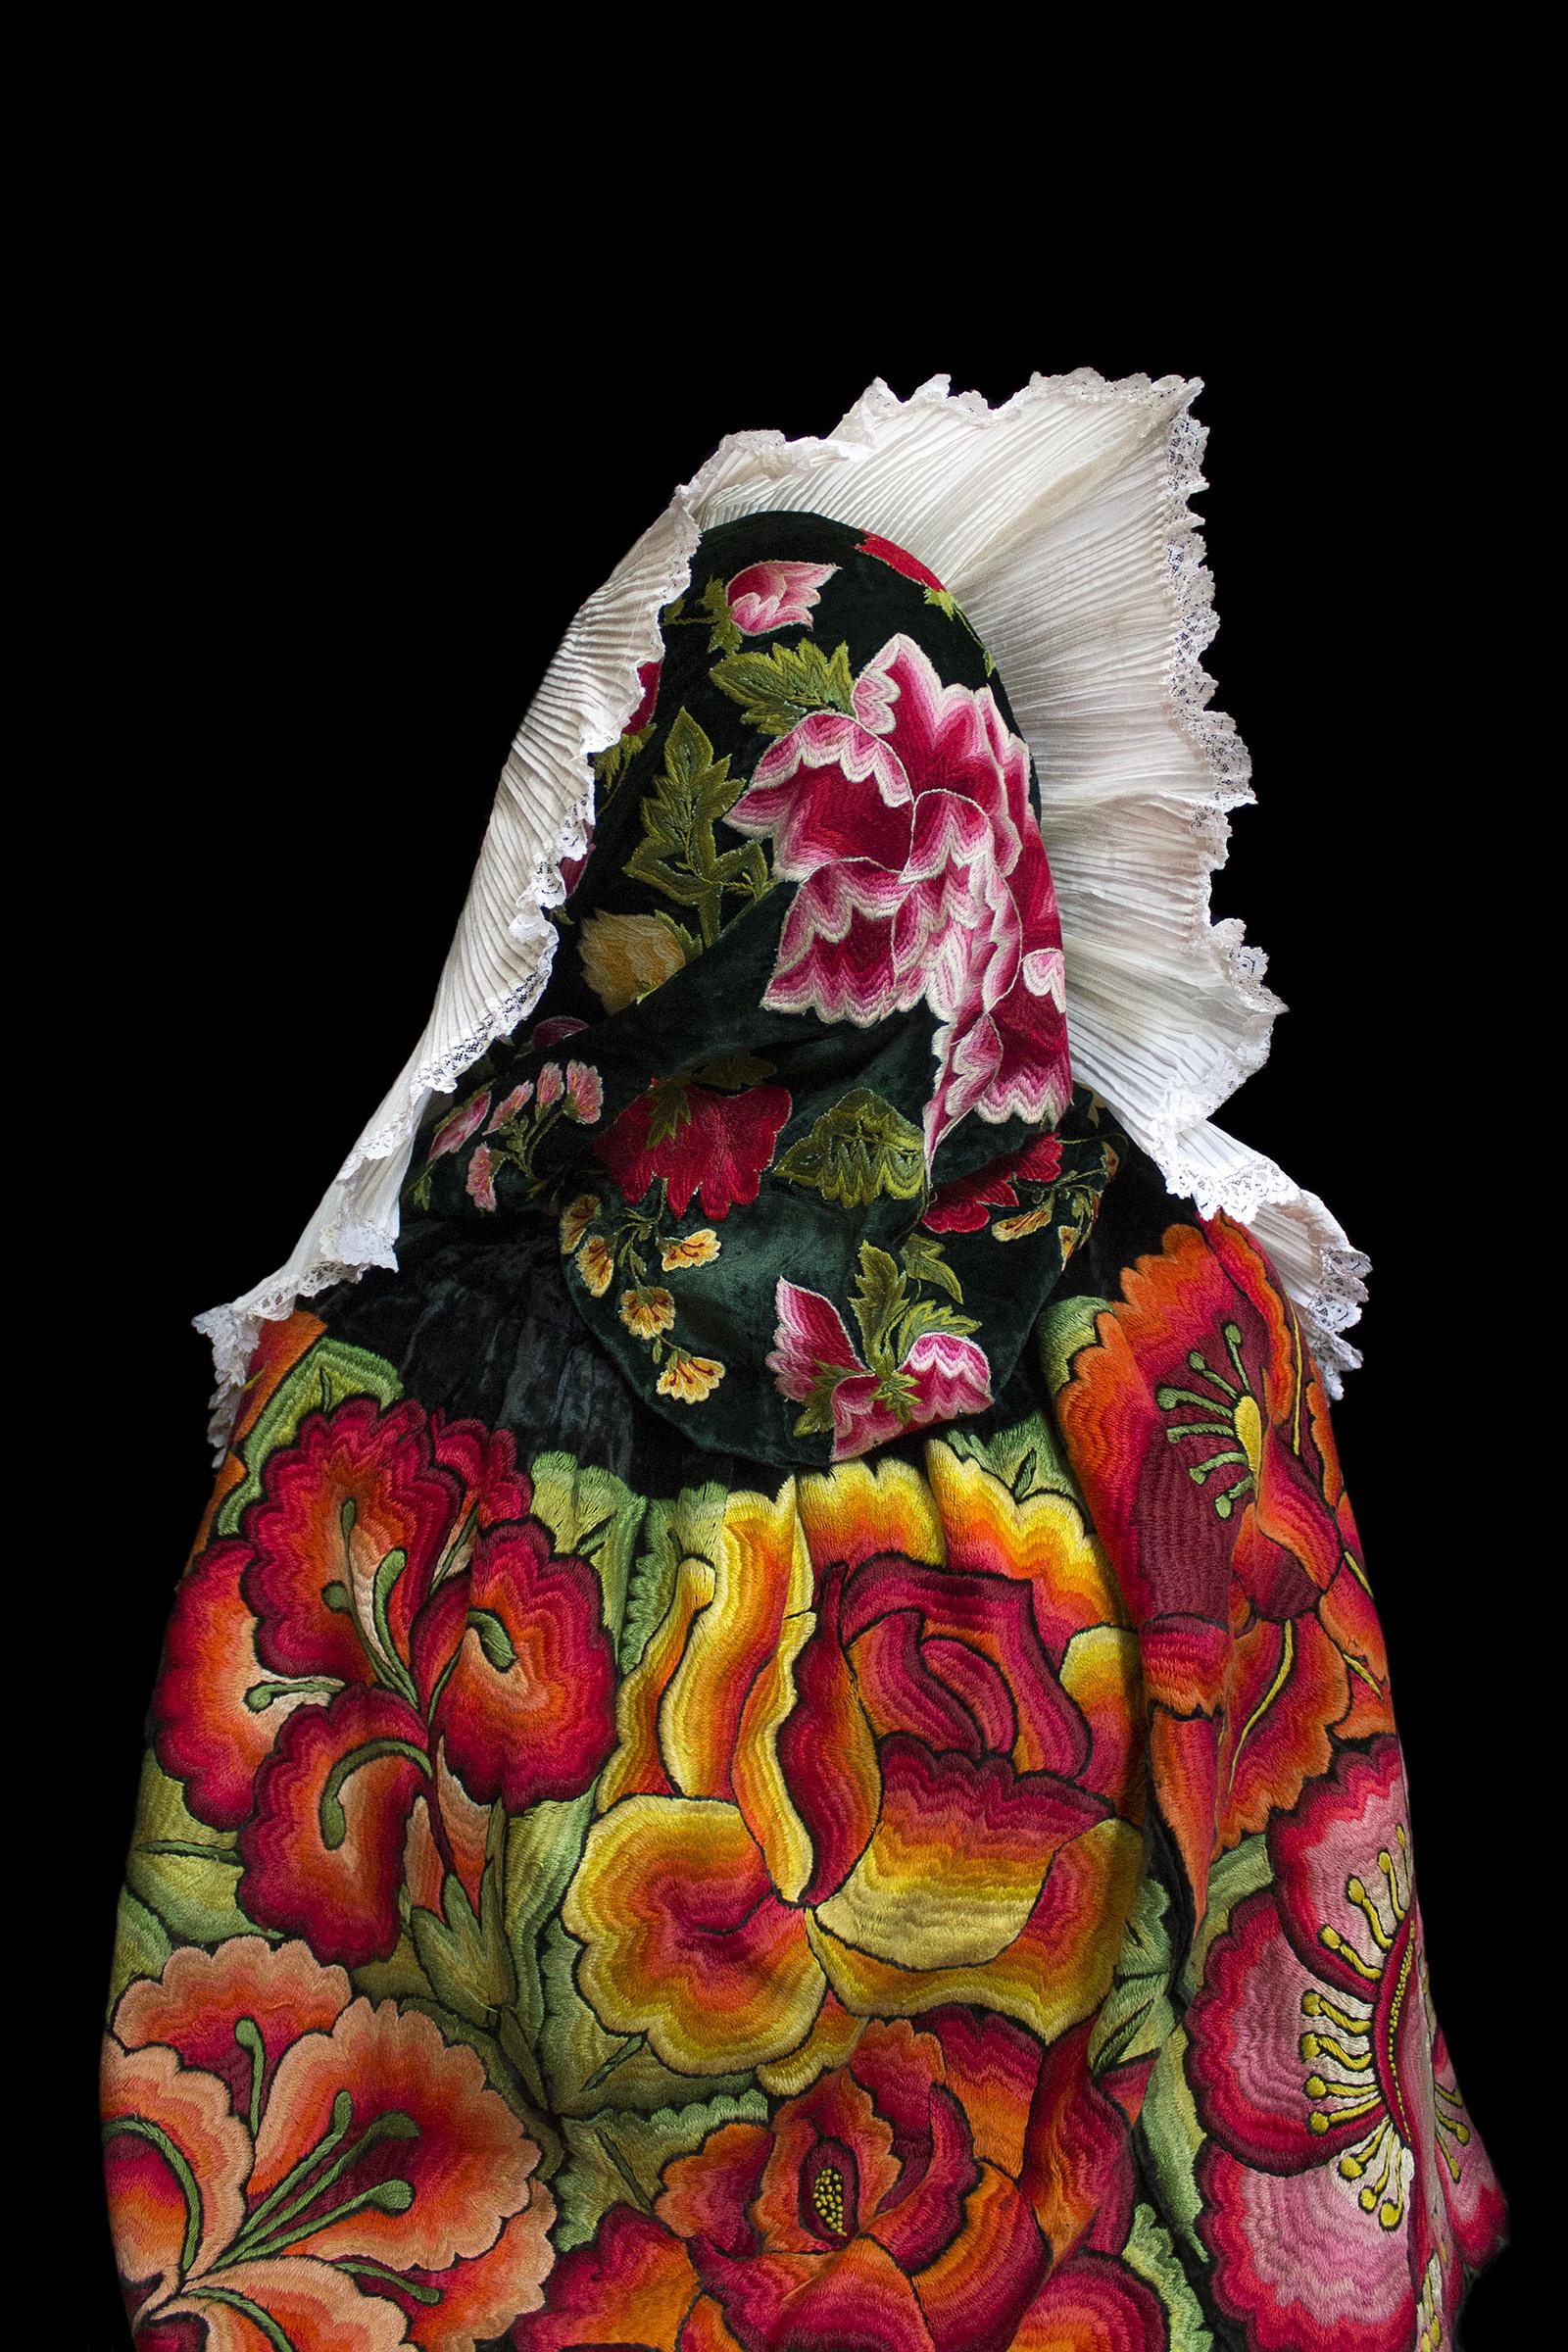 Resplandor , 2017, BORDERLAND Series, 107 cm x 72 cm